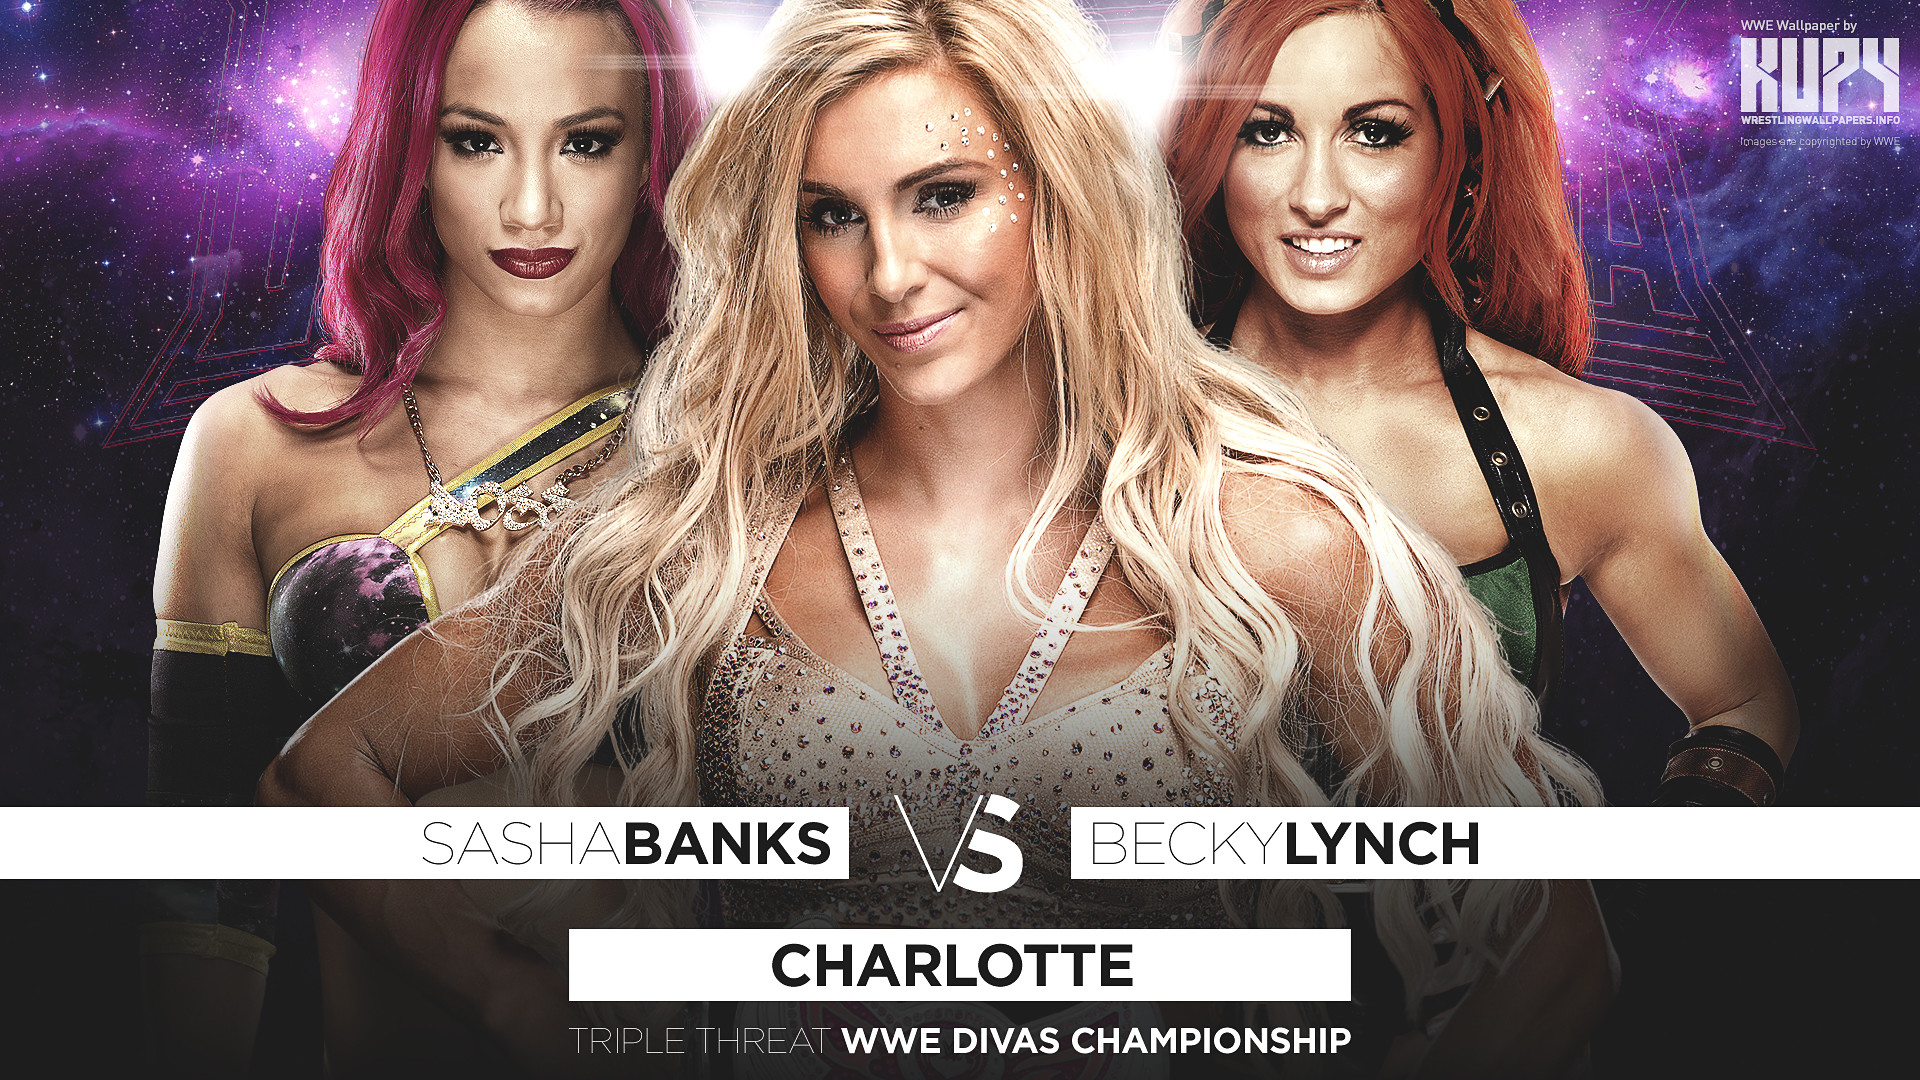 Triple Threat WWE Divas Championship match WrestleMania 32 wallpaper  1920×1200   1920×1080 …